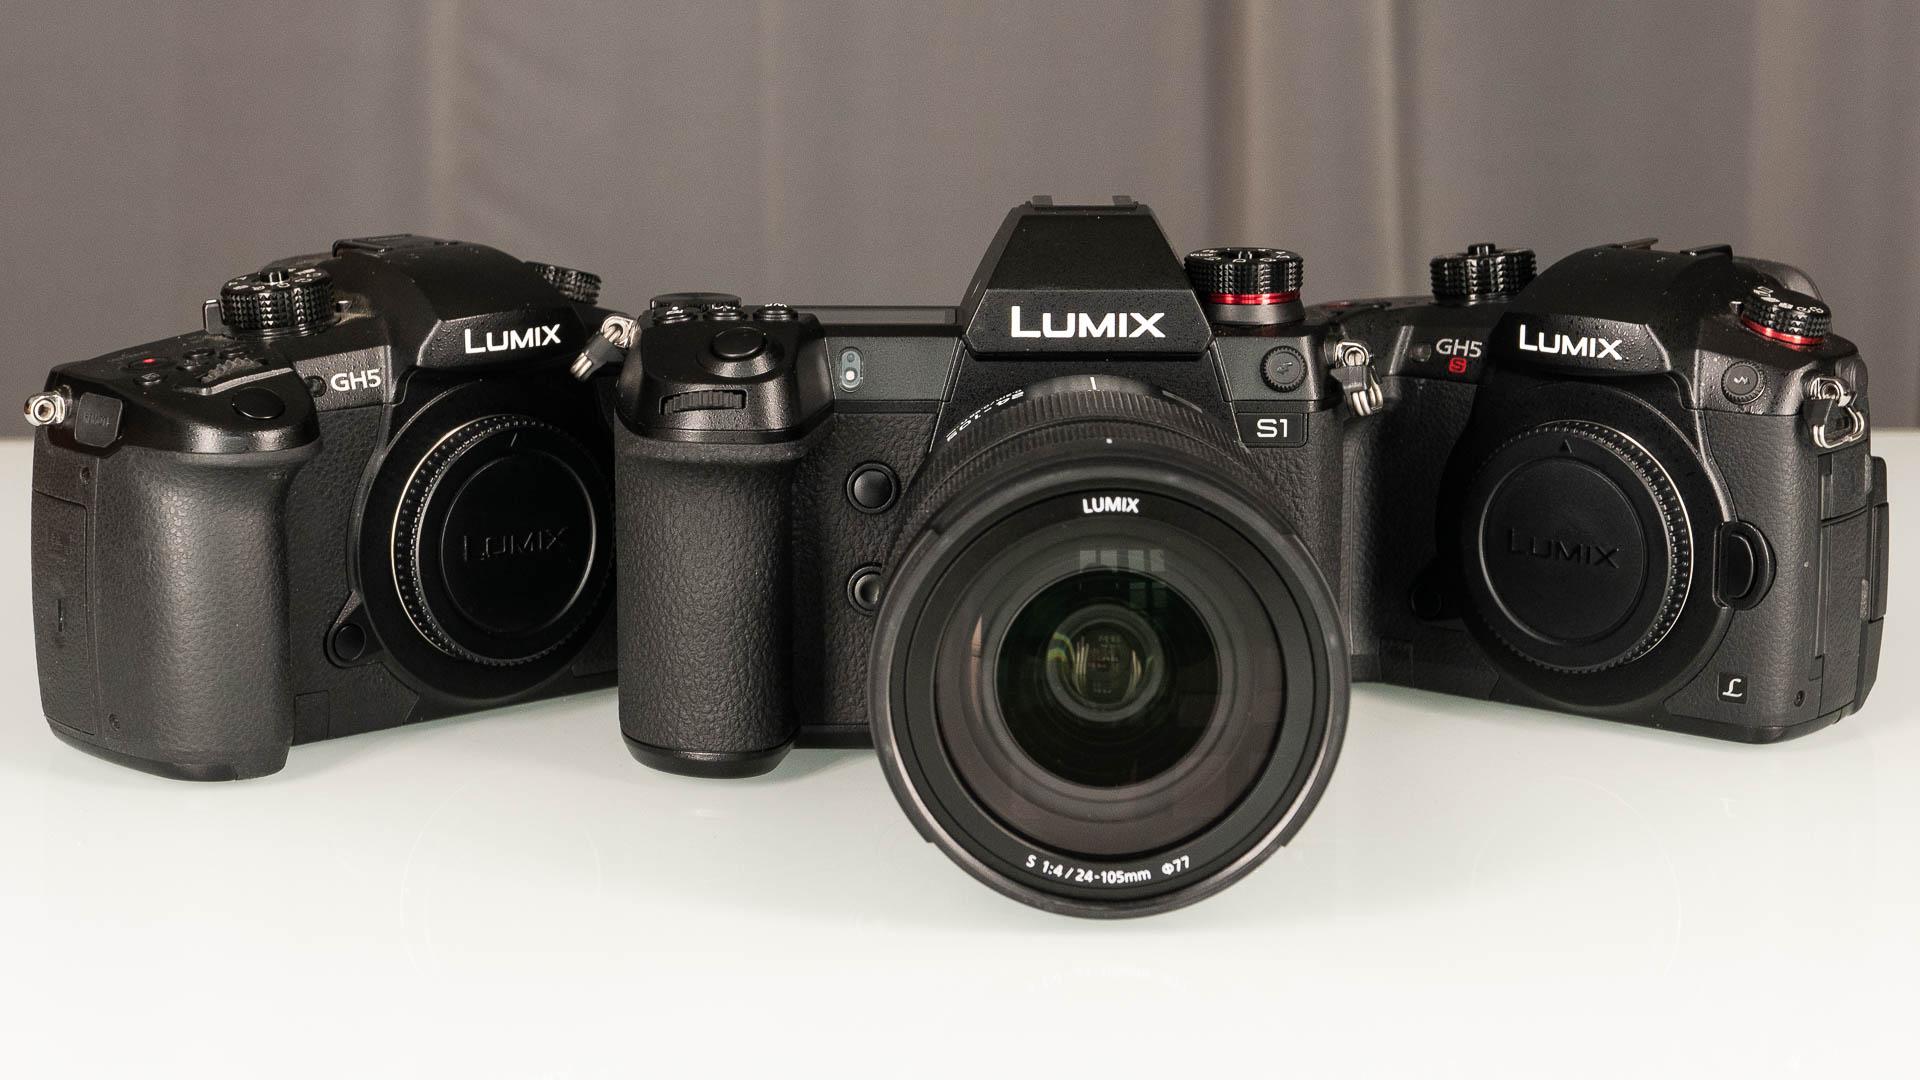 Panasonic anuncia actualización de firmware para LUMIX S1R, S1 y cámaras M4/3 seleccionadas